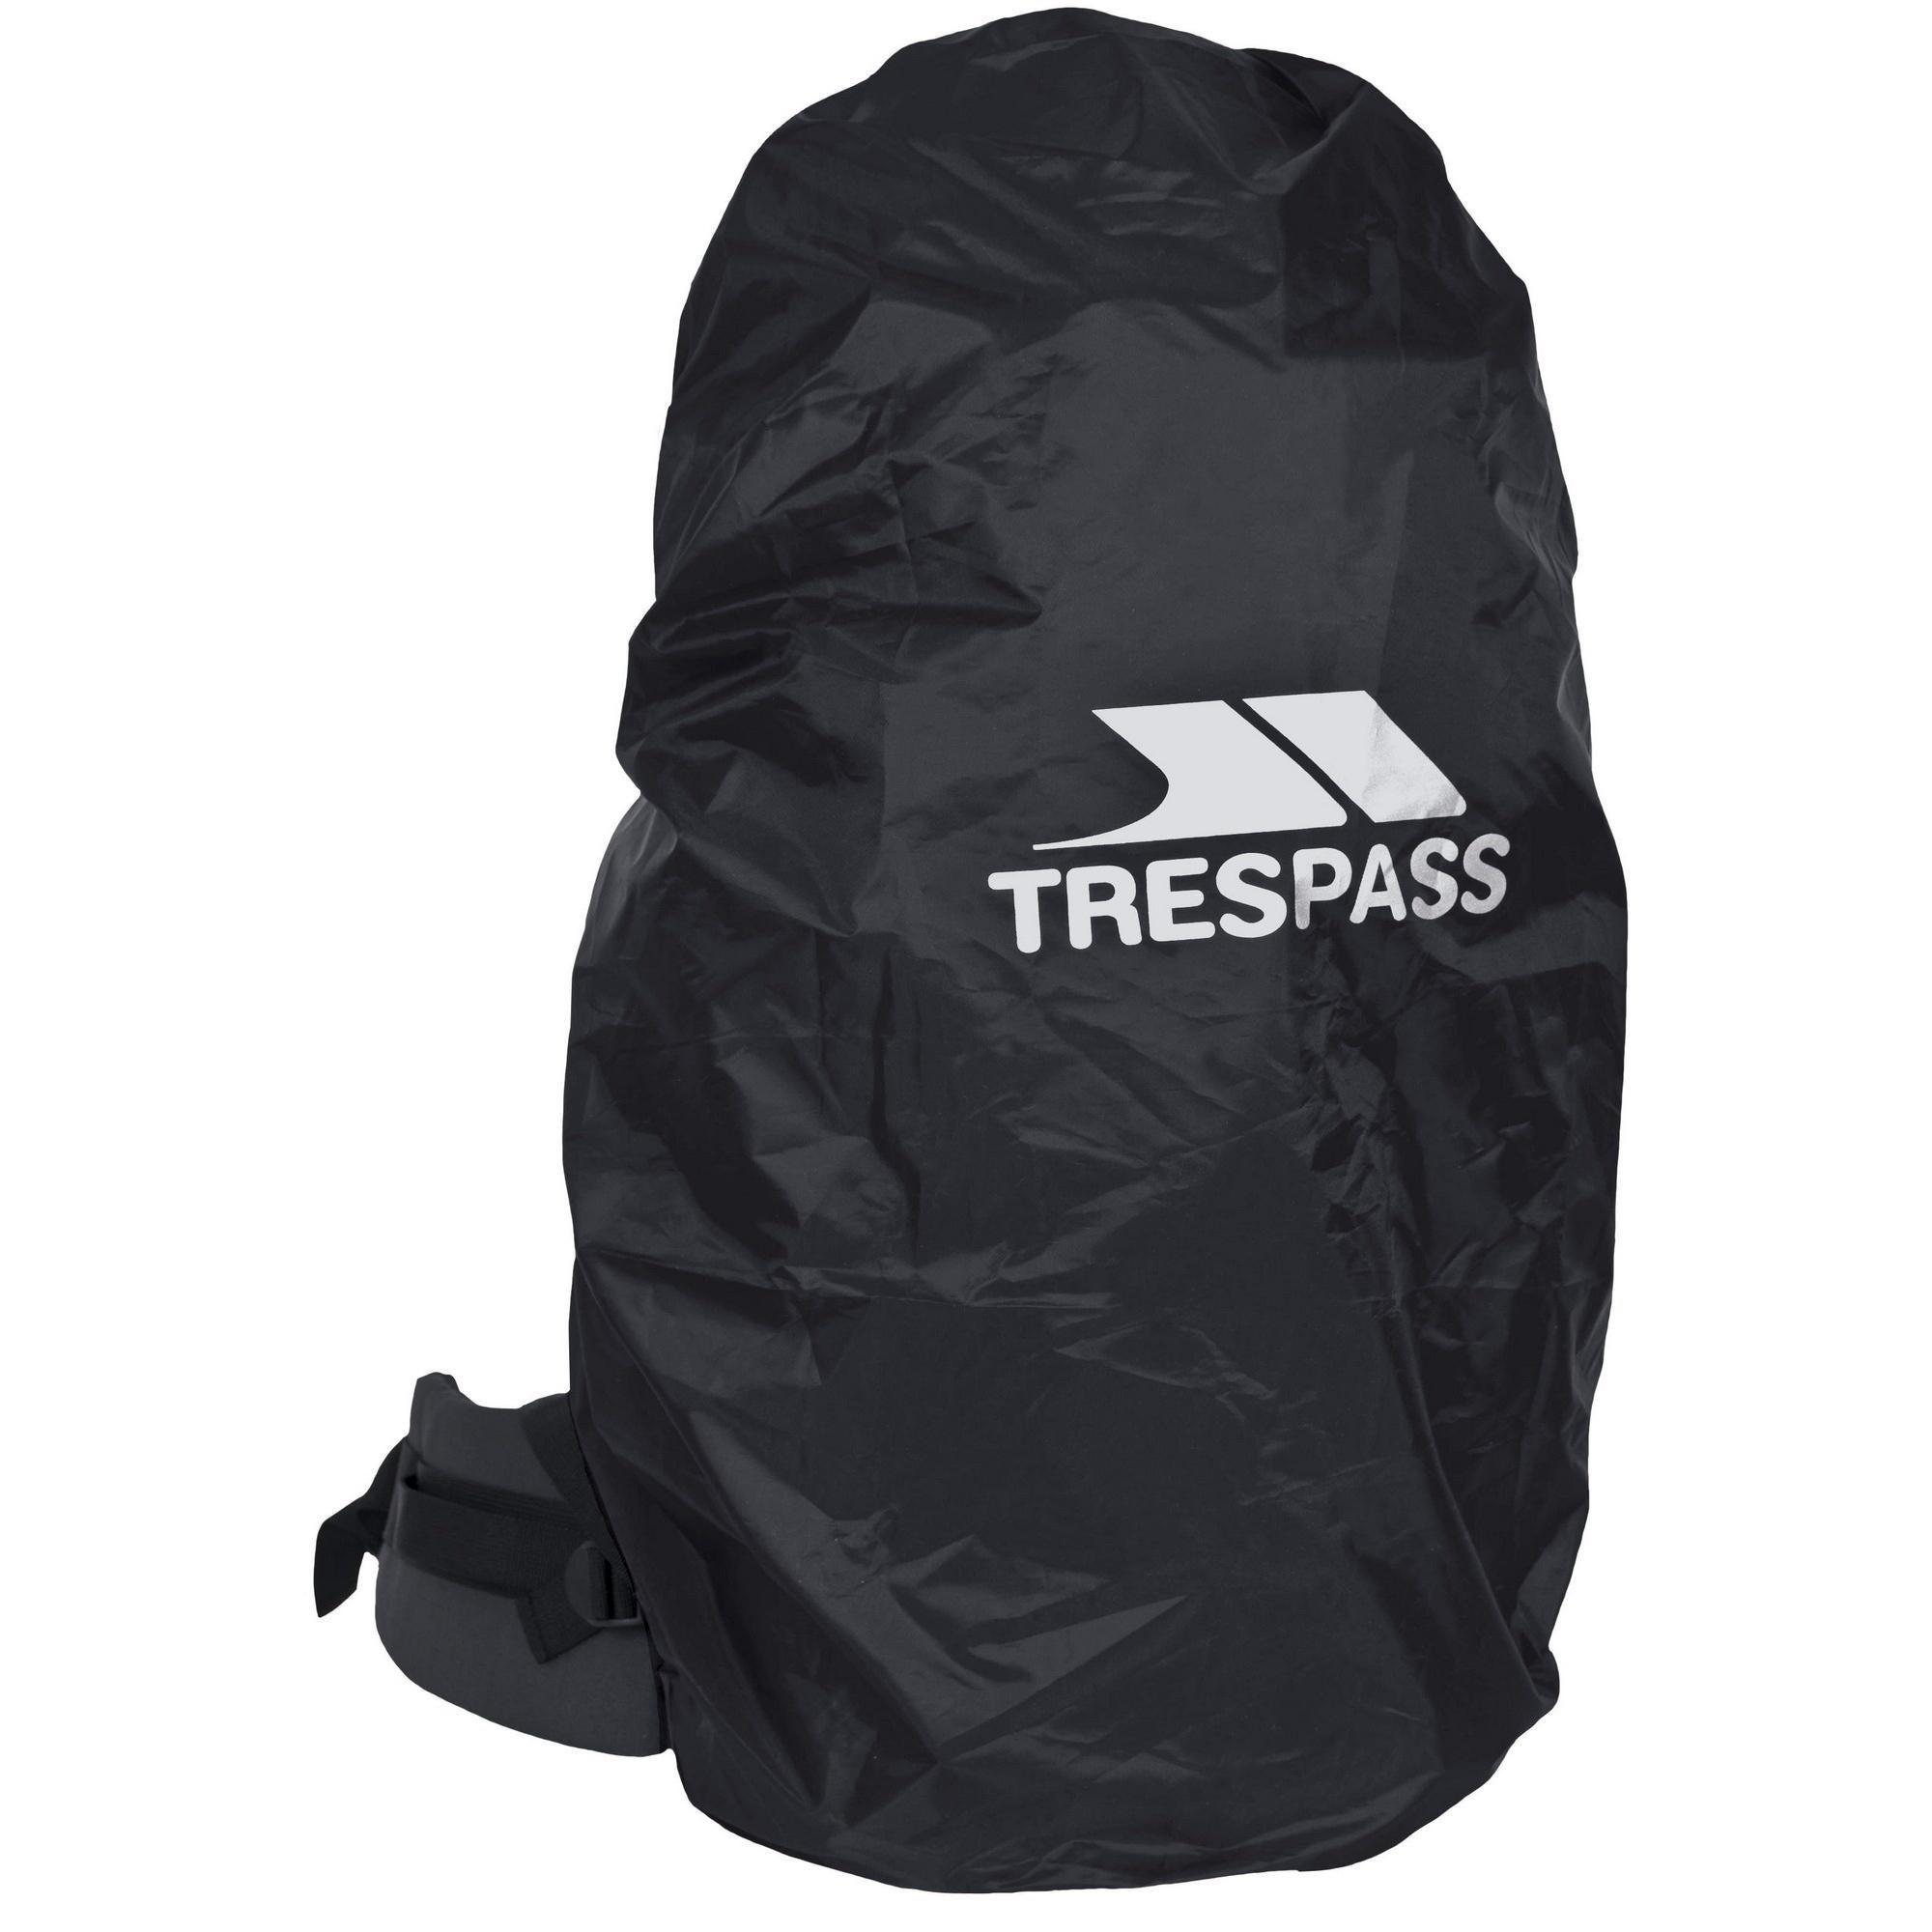 Trespass Rain Waterproof Rucksack//Backpack Cover TP505